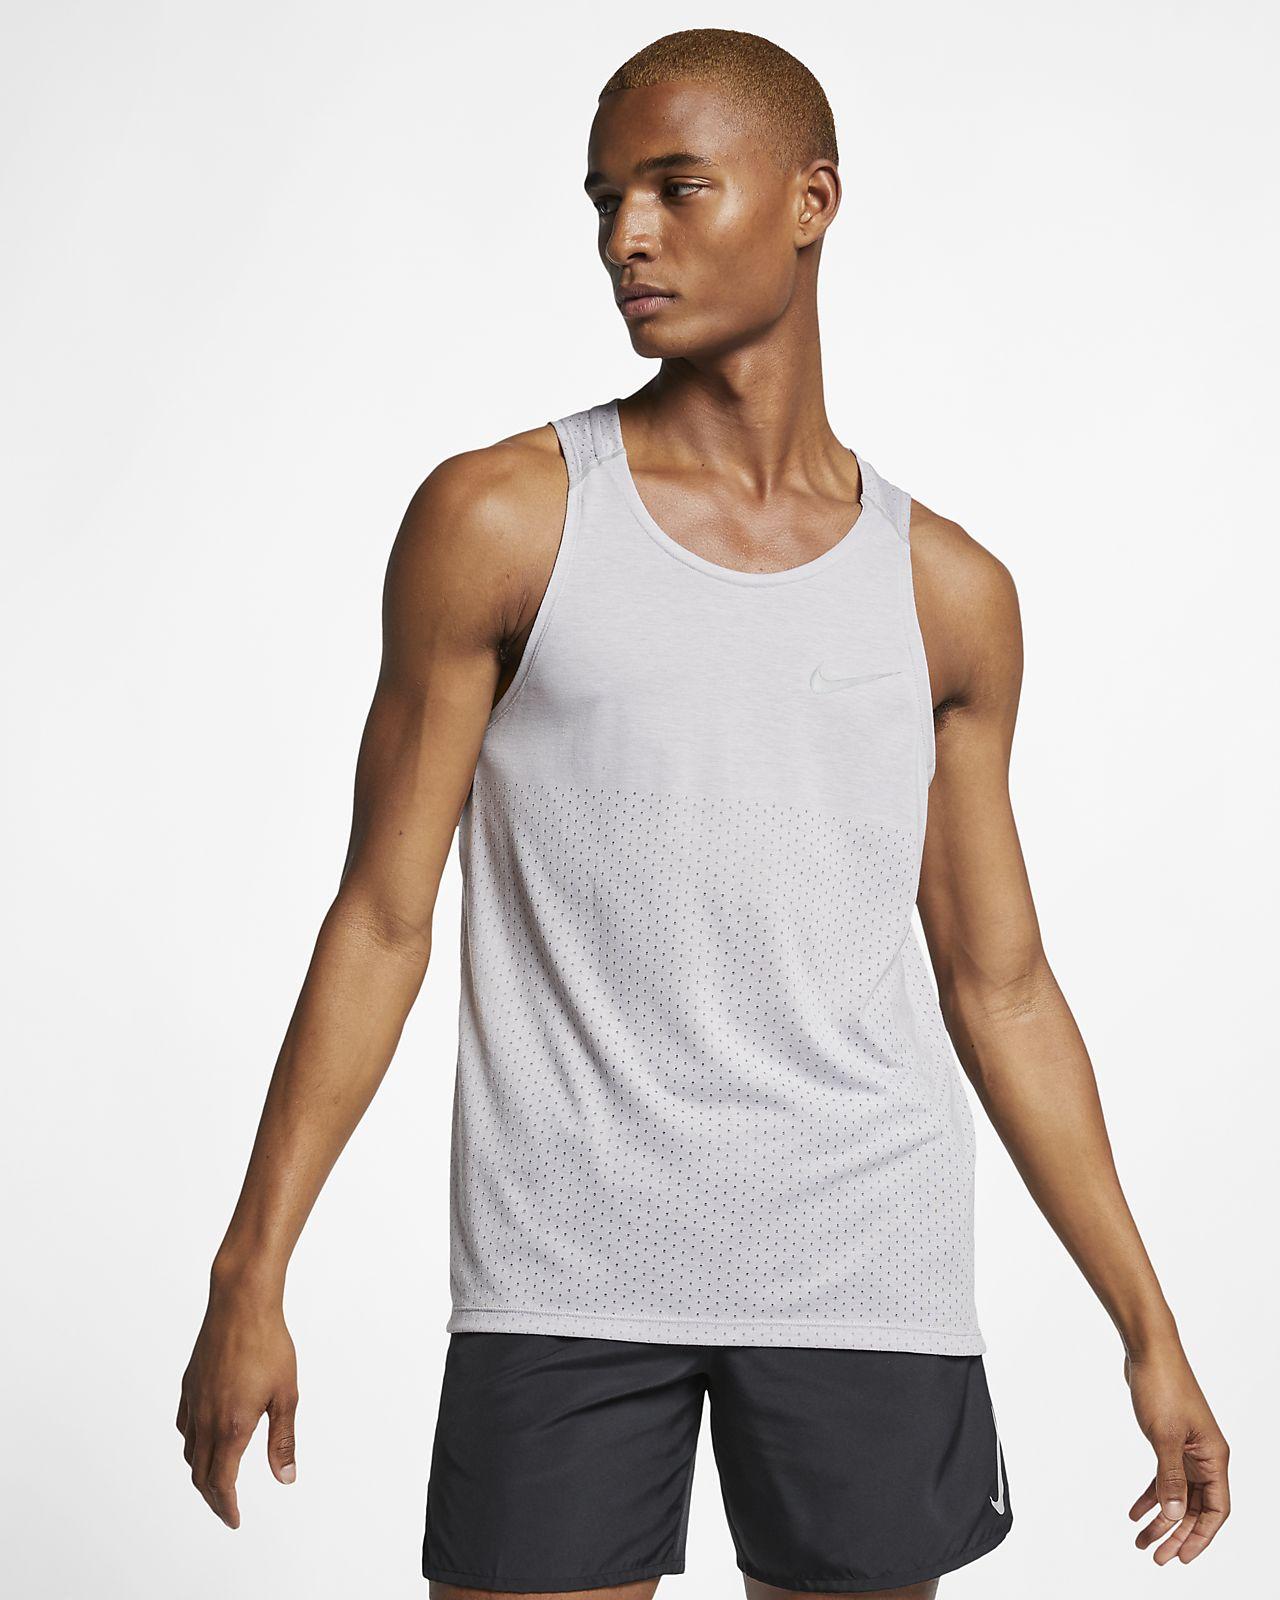 Rise Nike Tirantes Running Hombre Camiseta De 365 stBQCxhdr